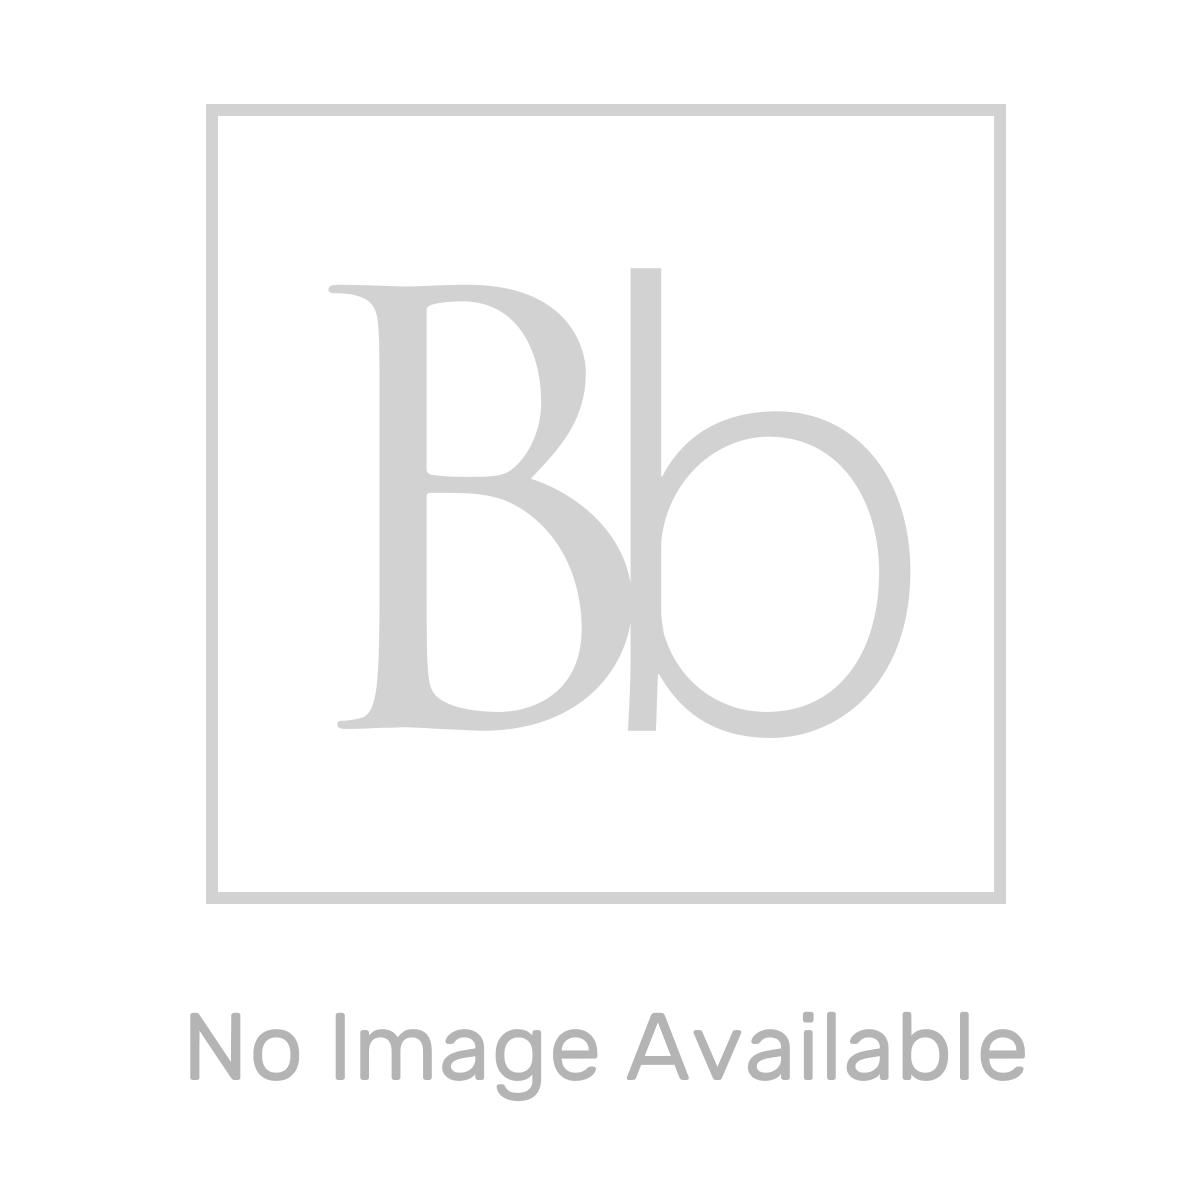 Croydex Blanc Light Pull Cord White and Chrome